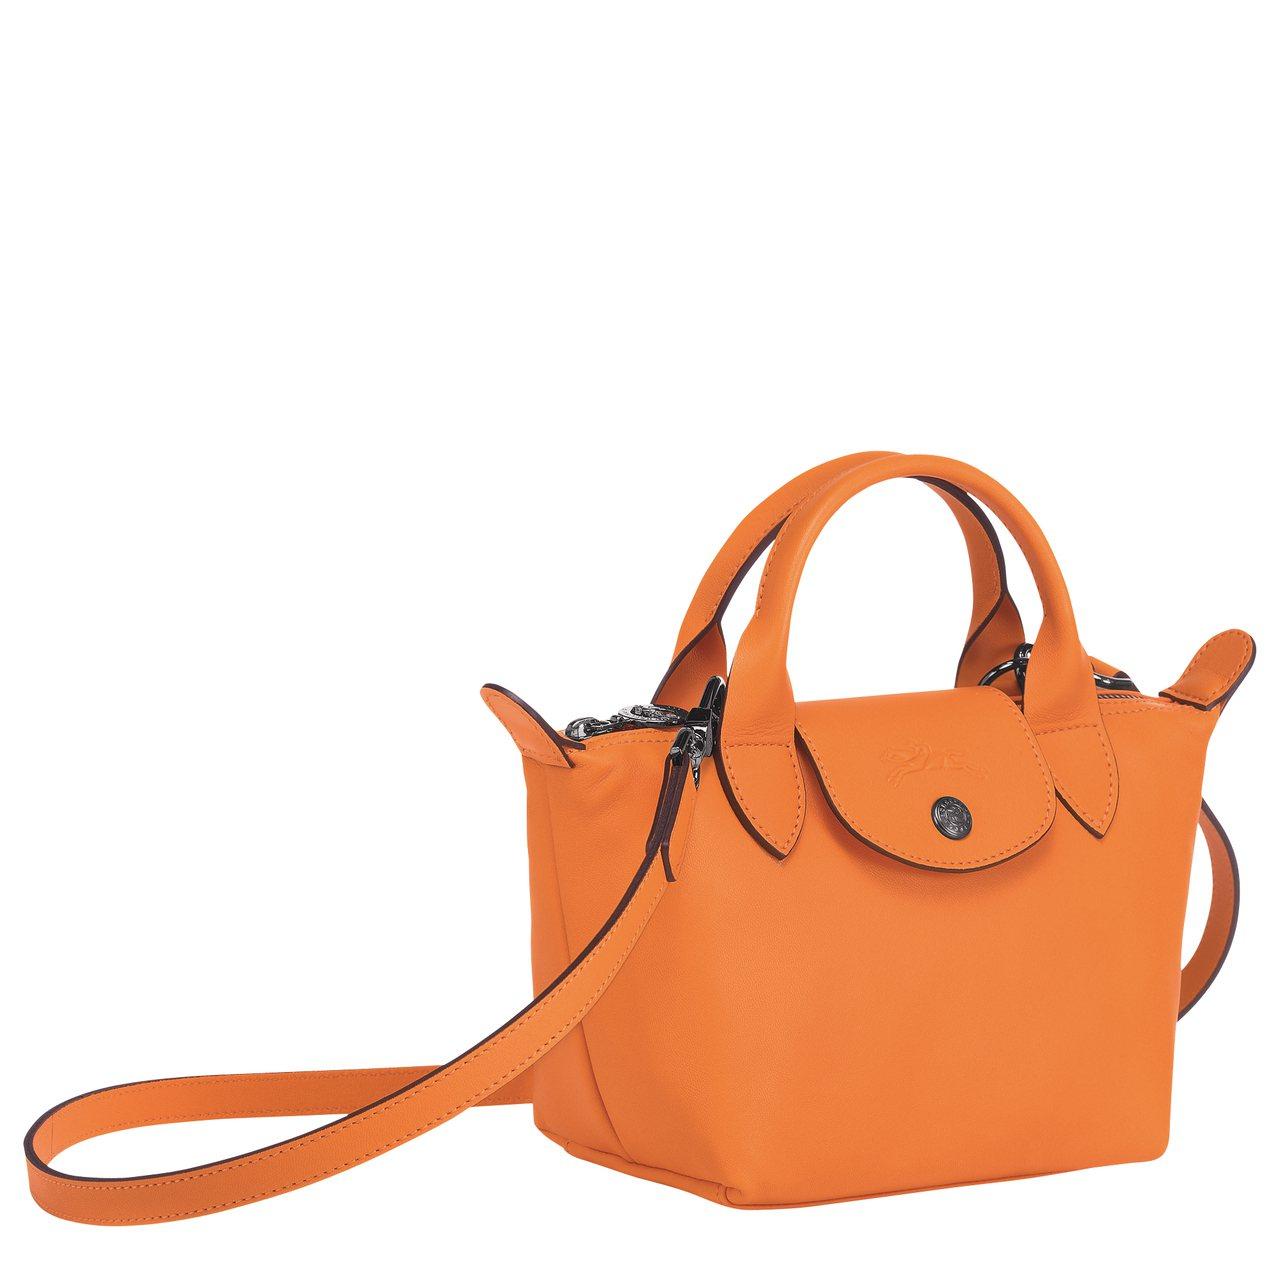 Le Pliage Cuir橘色手提包,售價13,600元。圖/LONGCHAM...